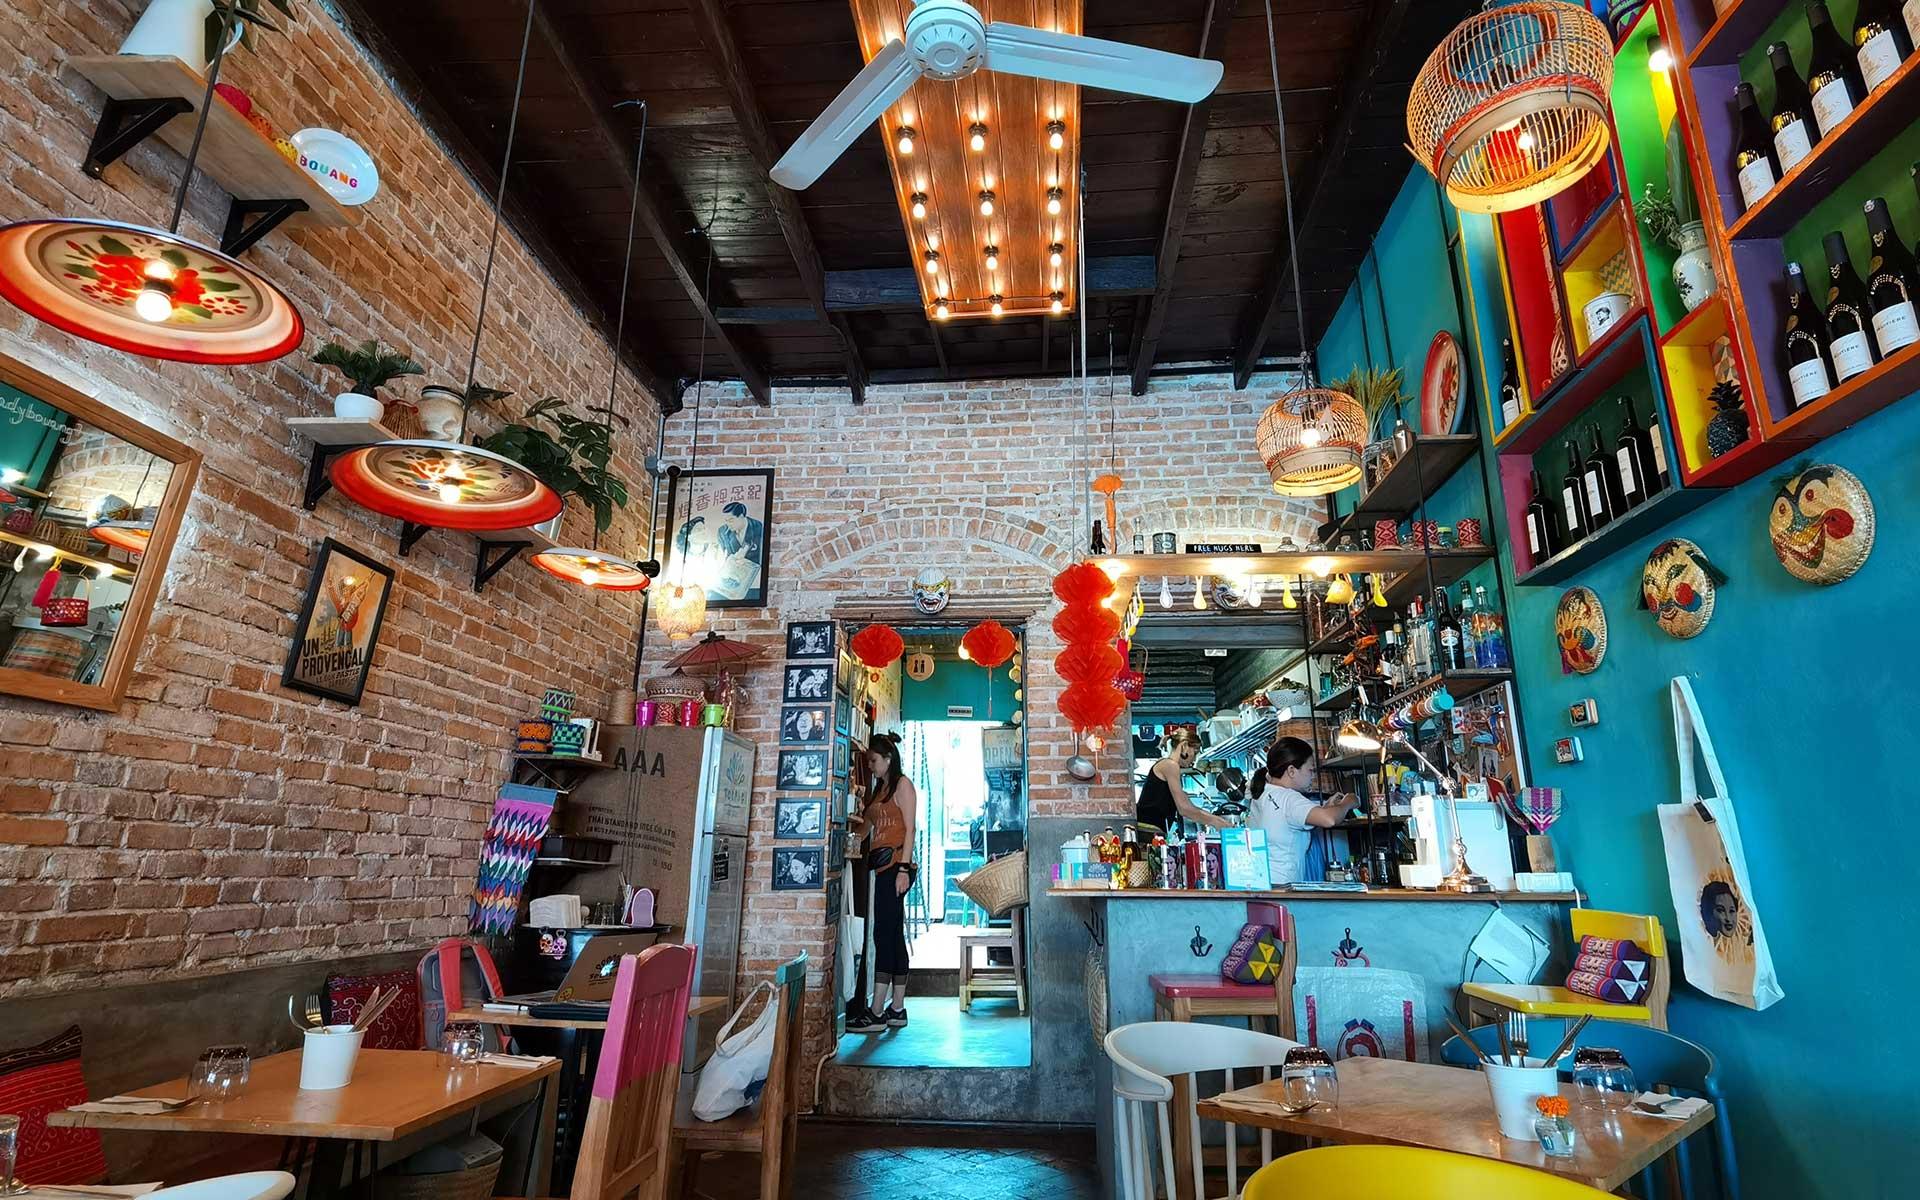 Bouang Restaurant luang prabang